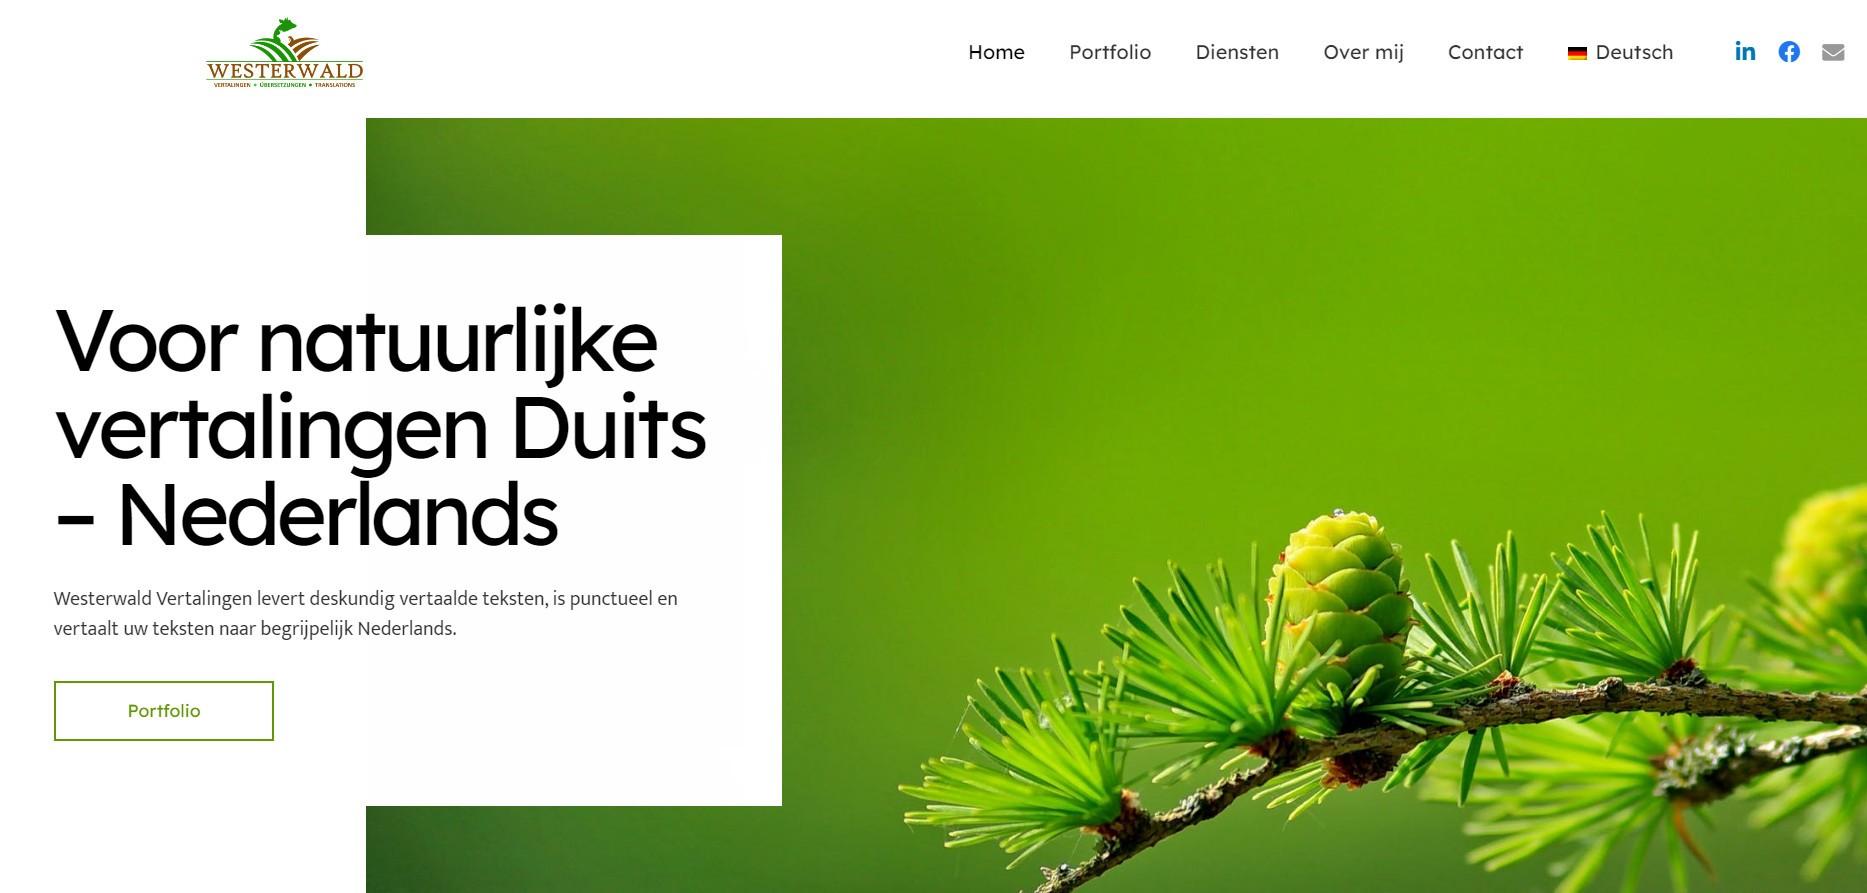 BeeWebdesign portfolio - Westerwald Vertalingen